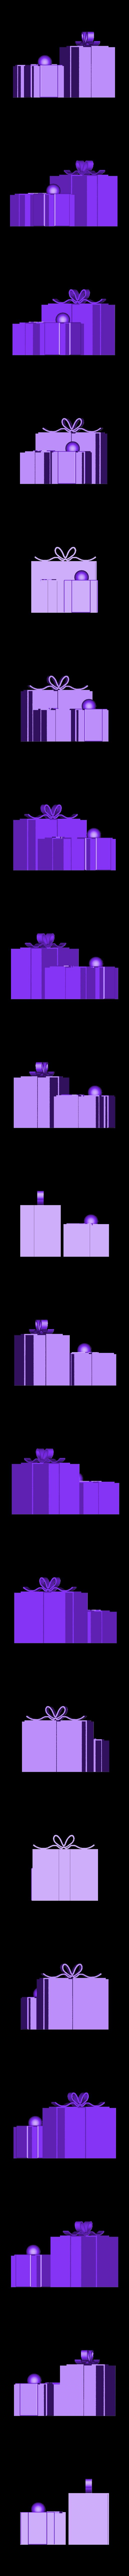 christmas_presents.stl Download free STL file Christmas Presents • 3D printer design, 3DBROOKLYN